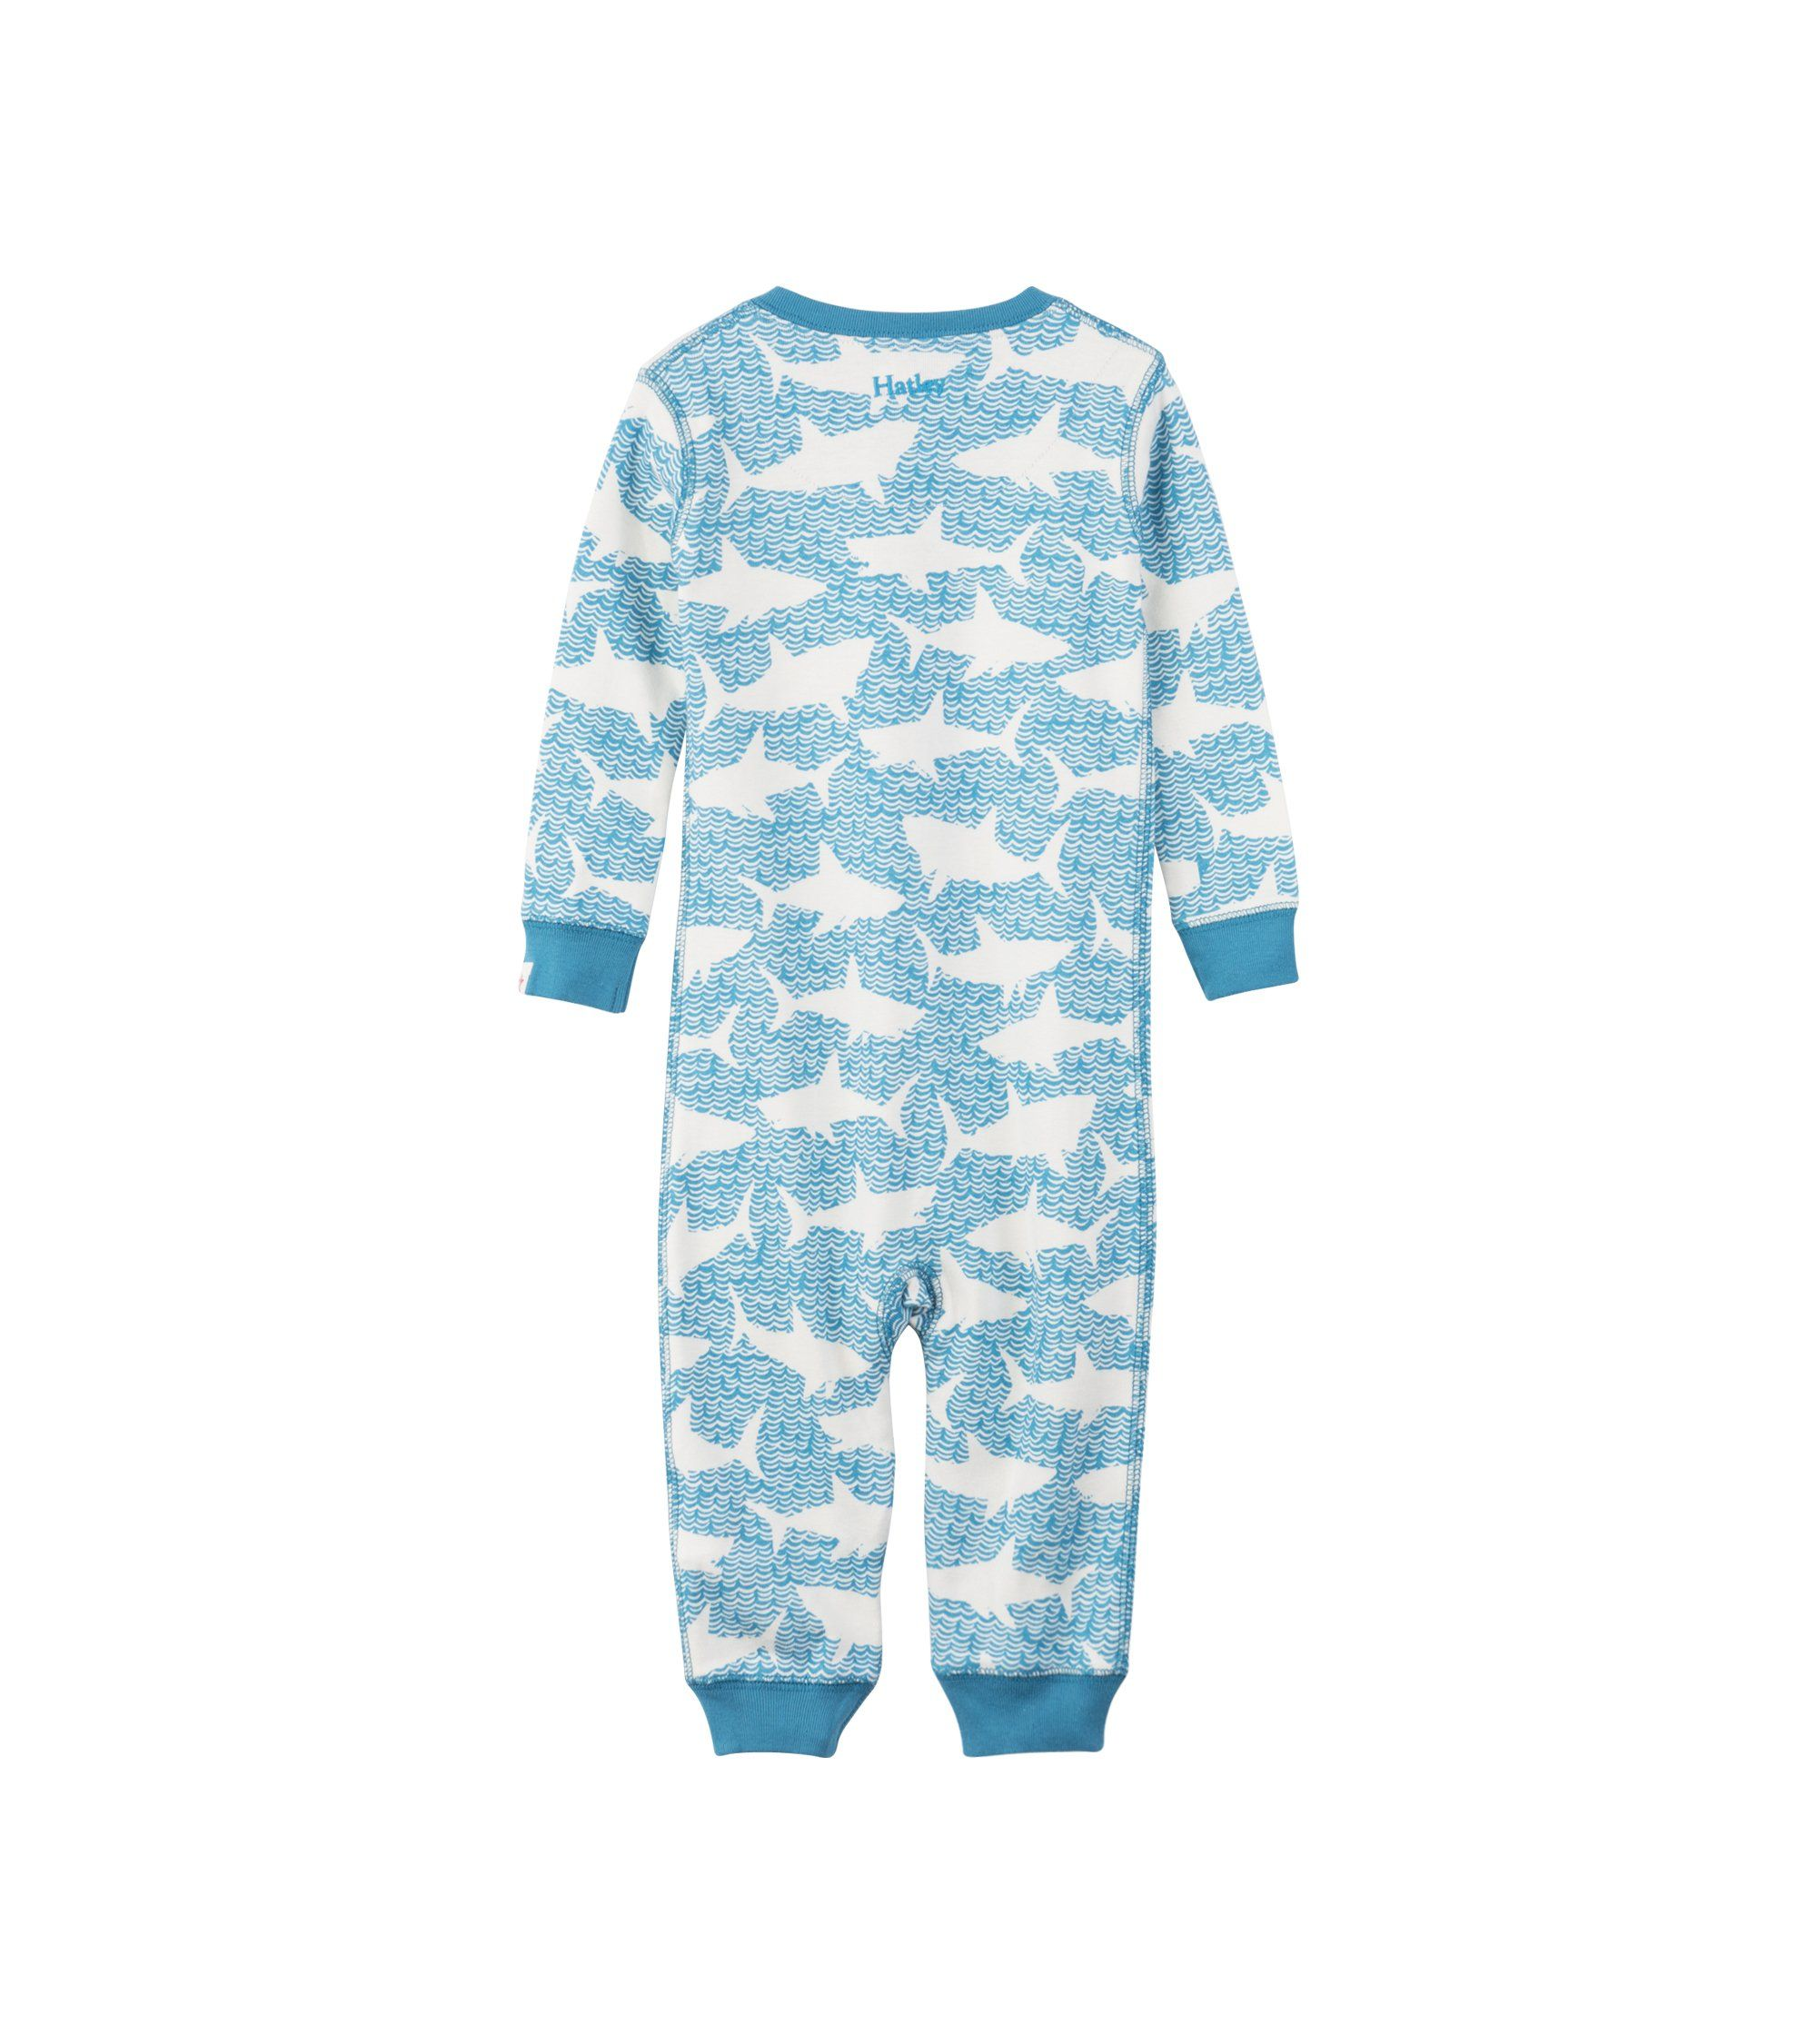 95b5df8a3296 Hatley Baby Boys Organic Cotton Sleeper Shark Alley 69 Months   To ...